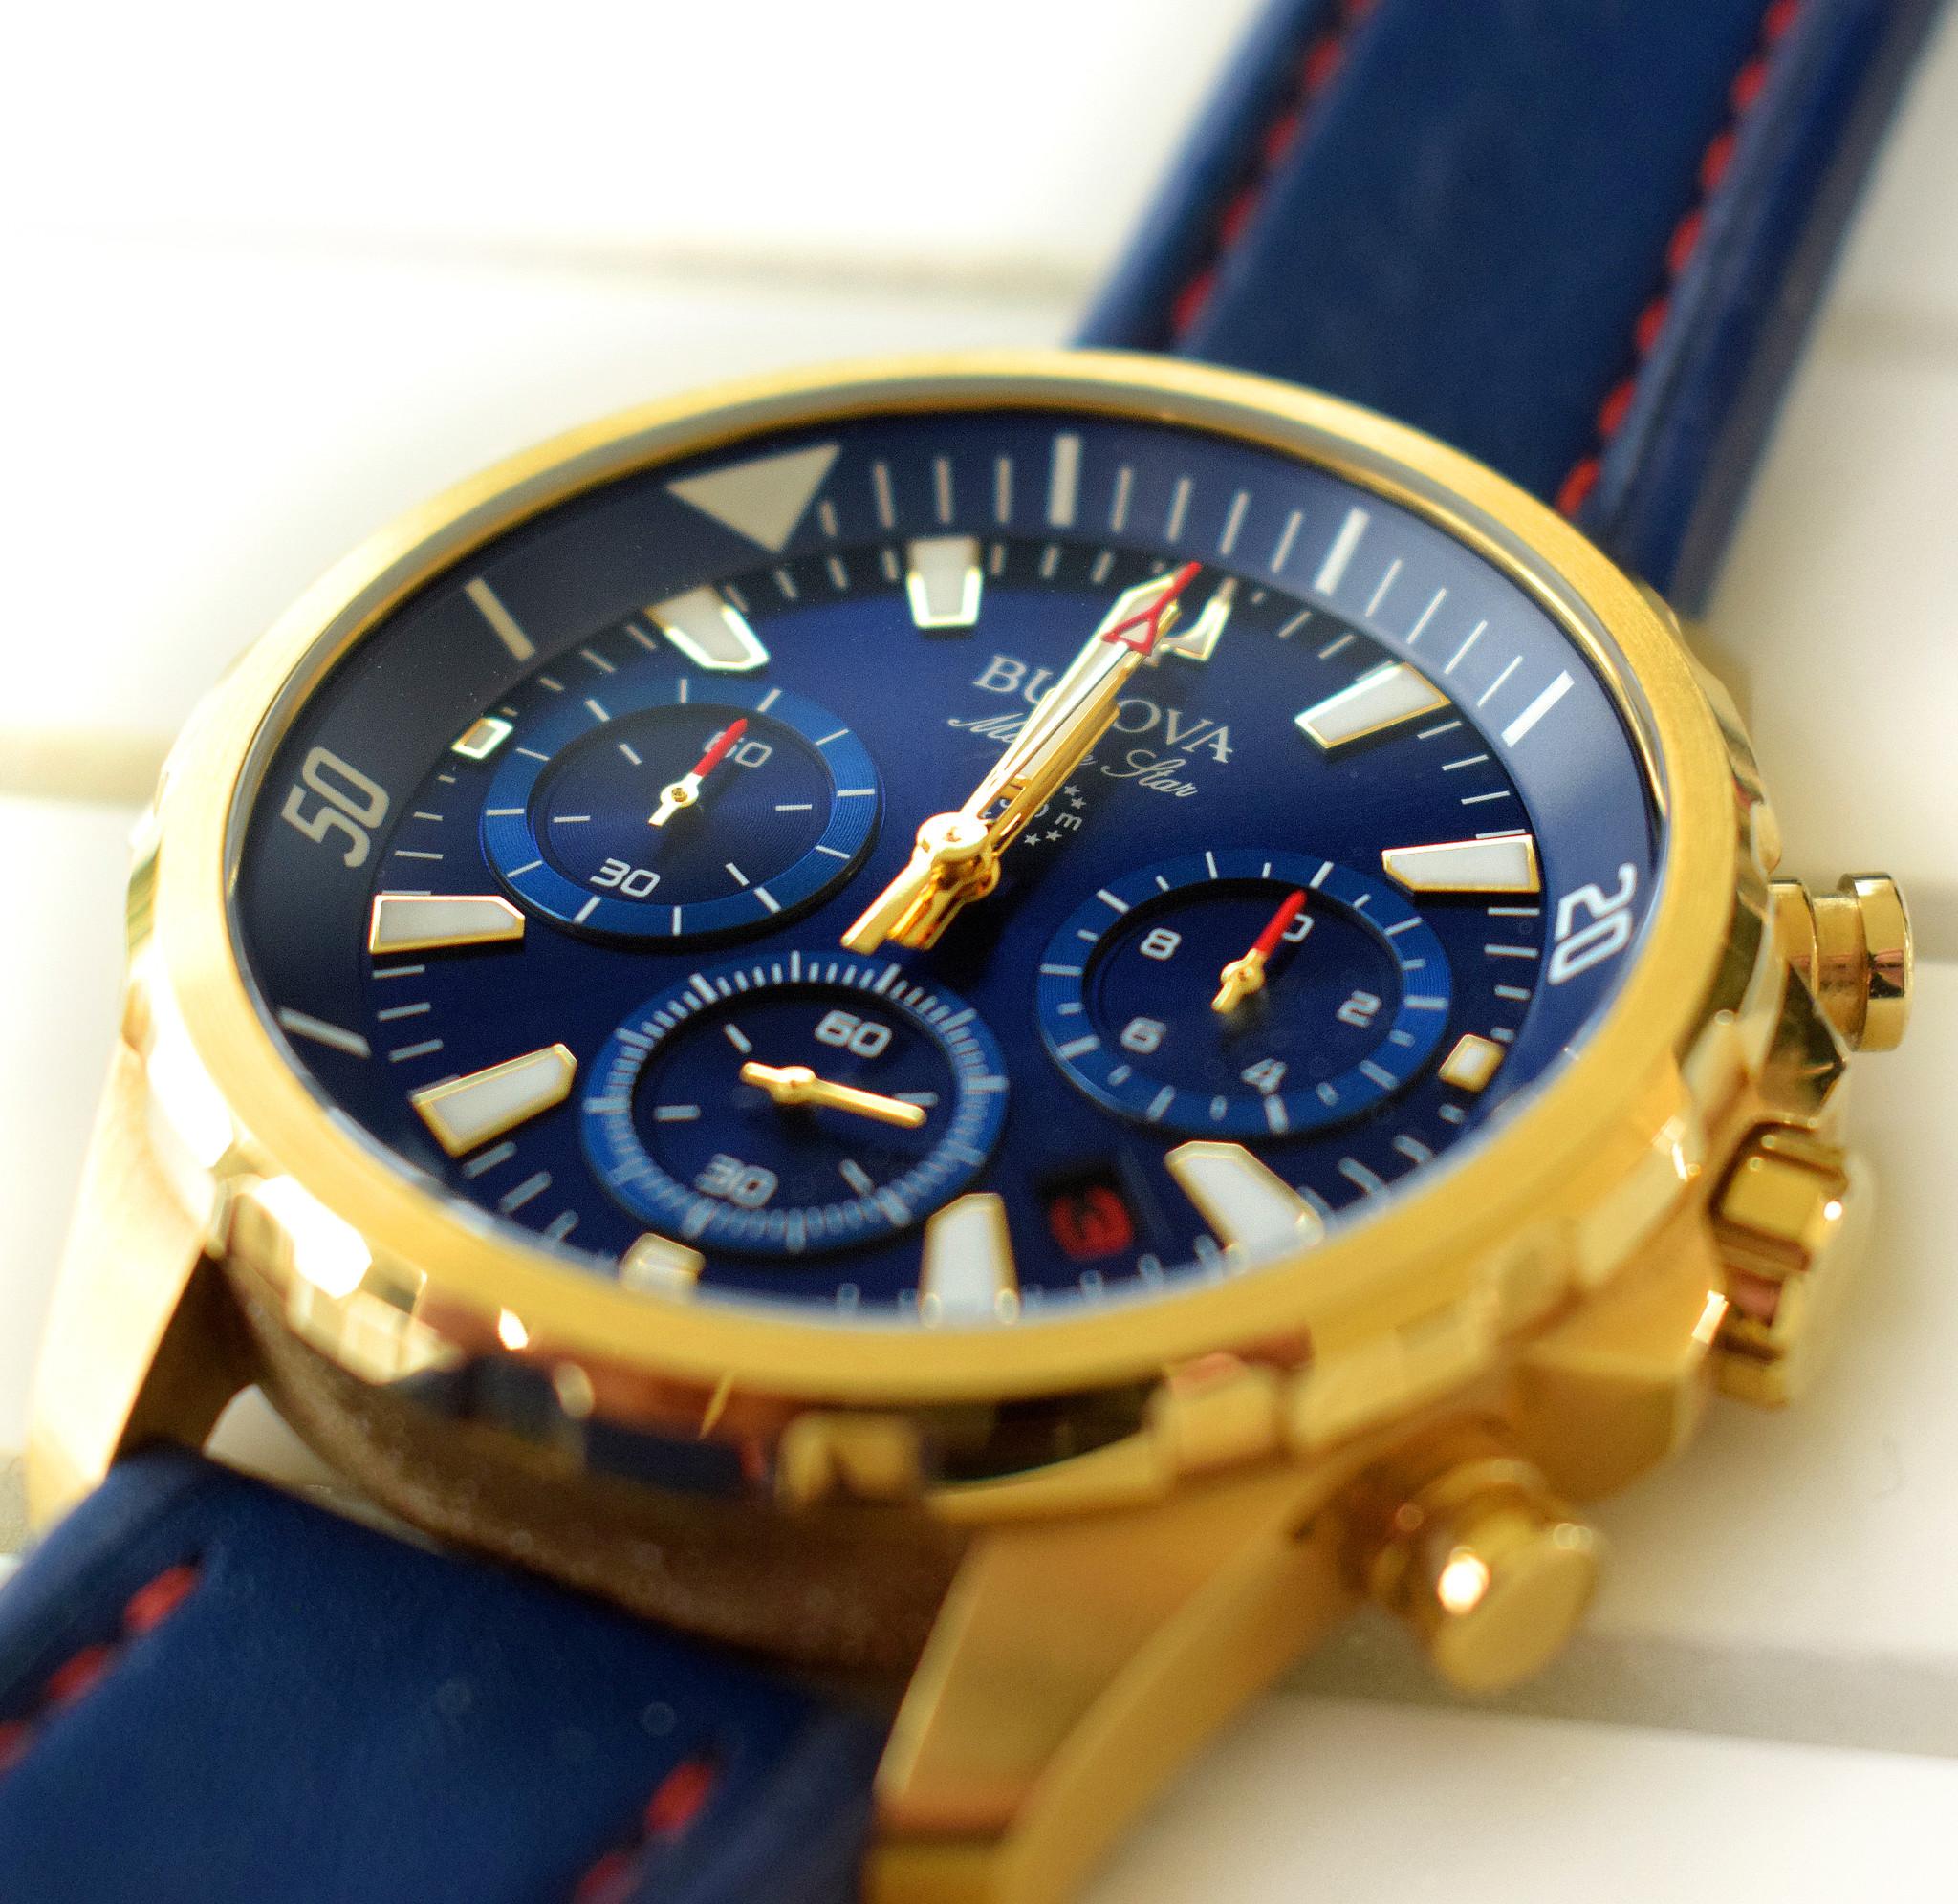 Luxe horloges: Bulova 97B168